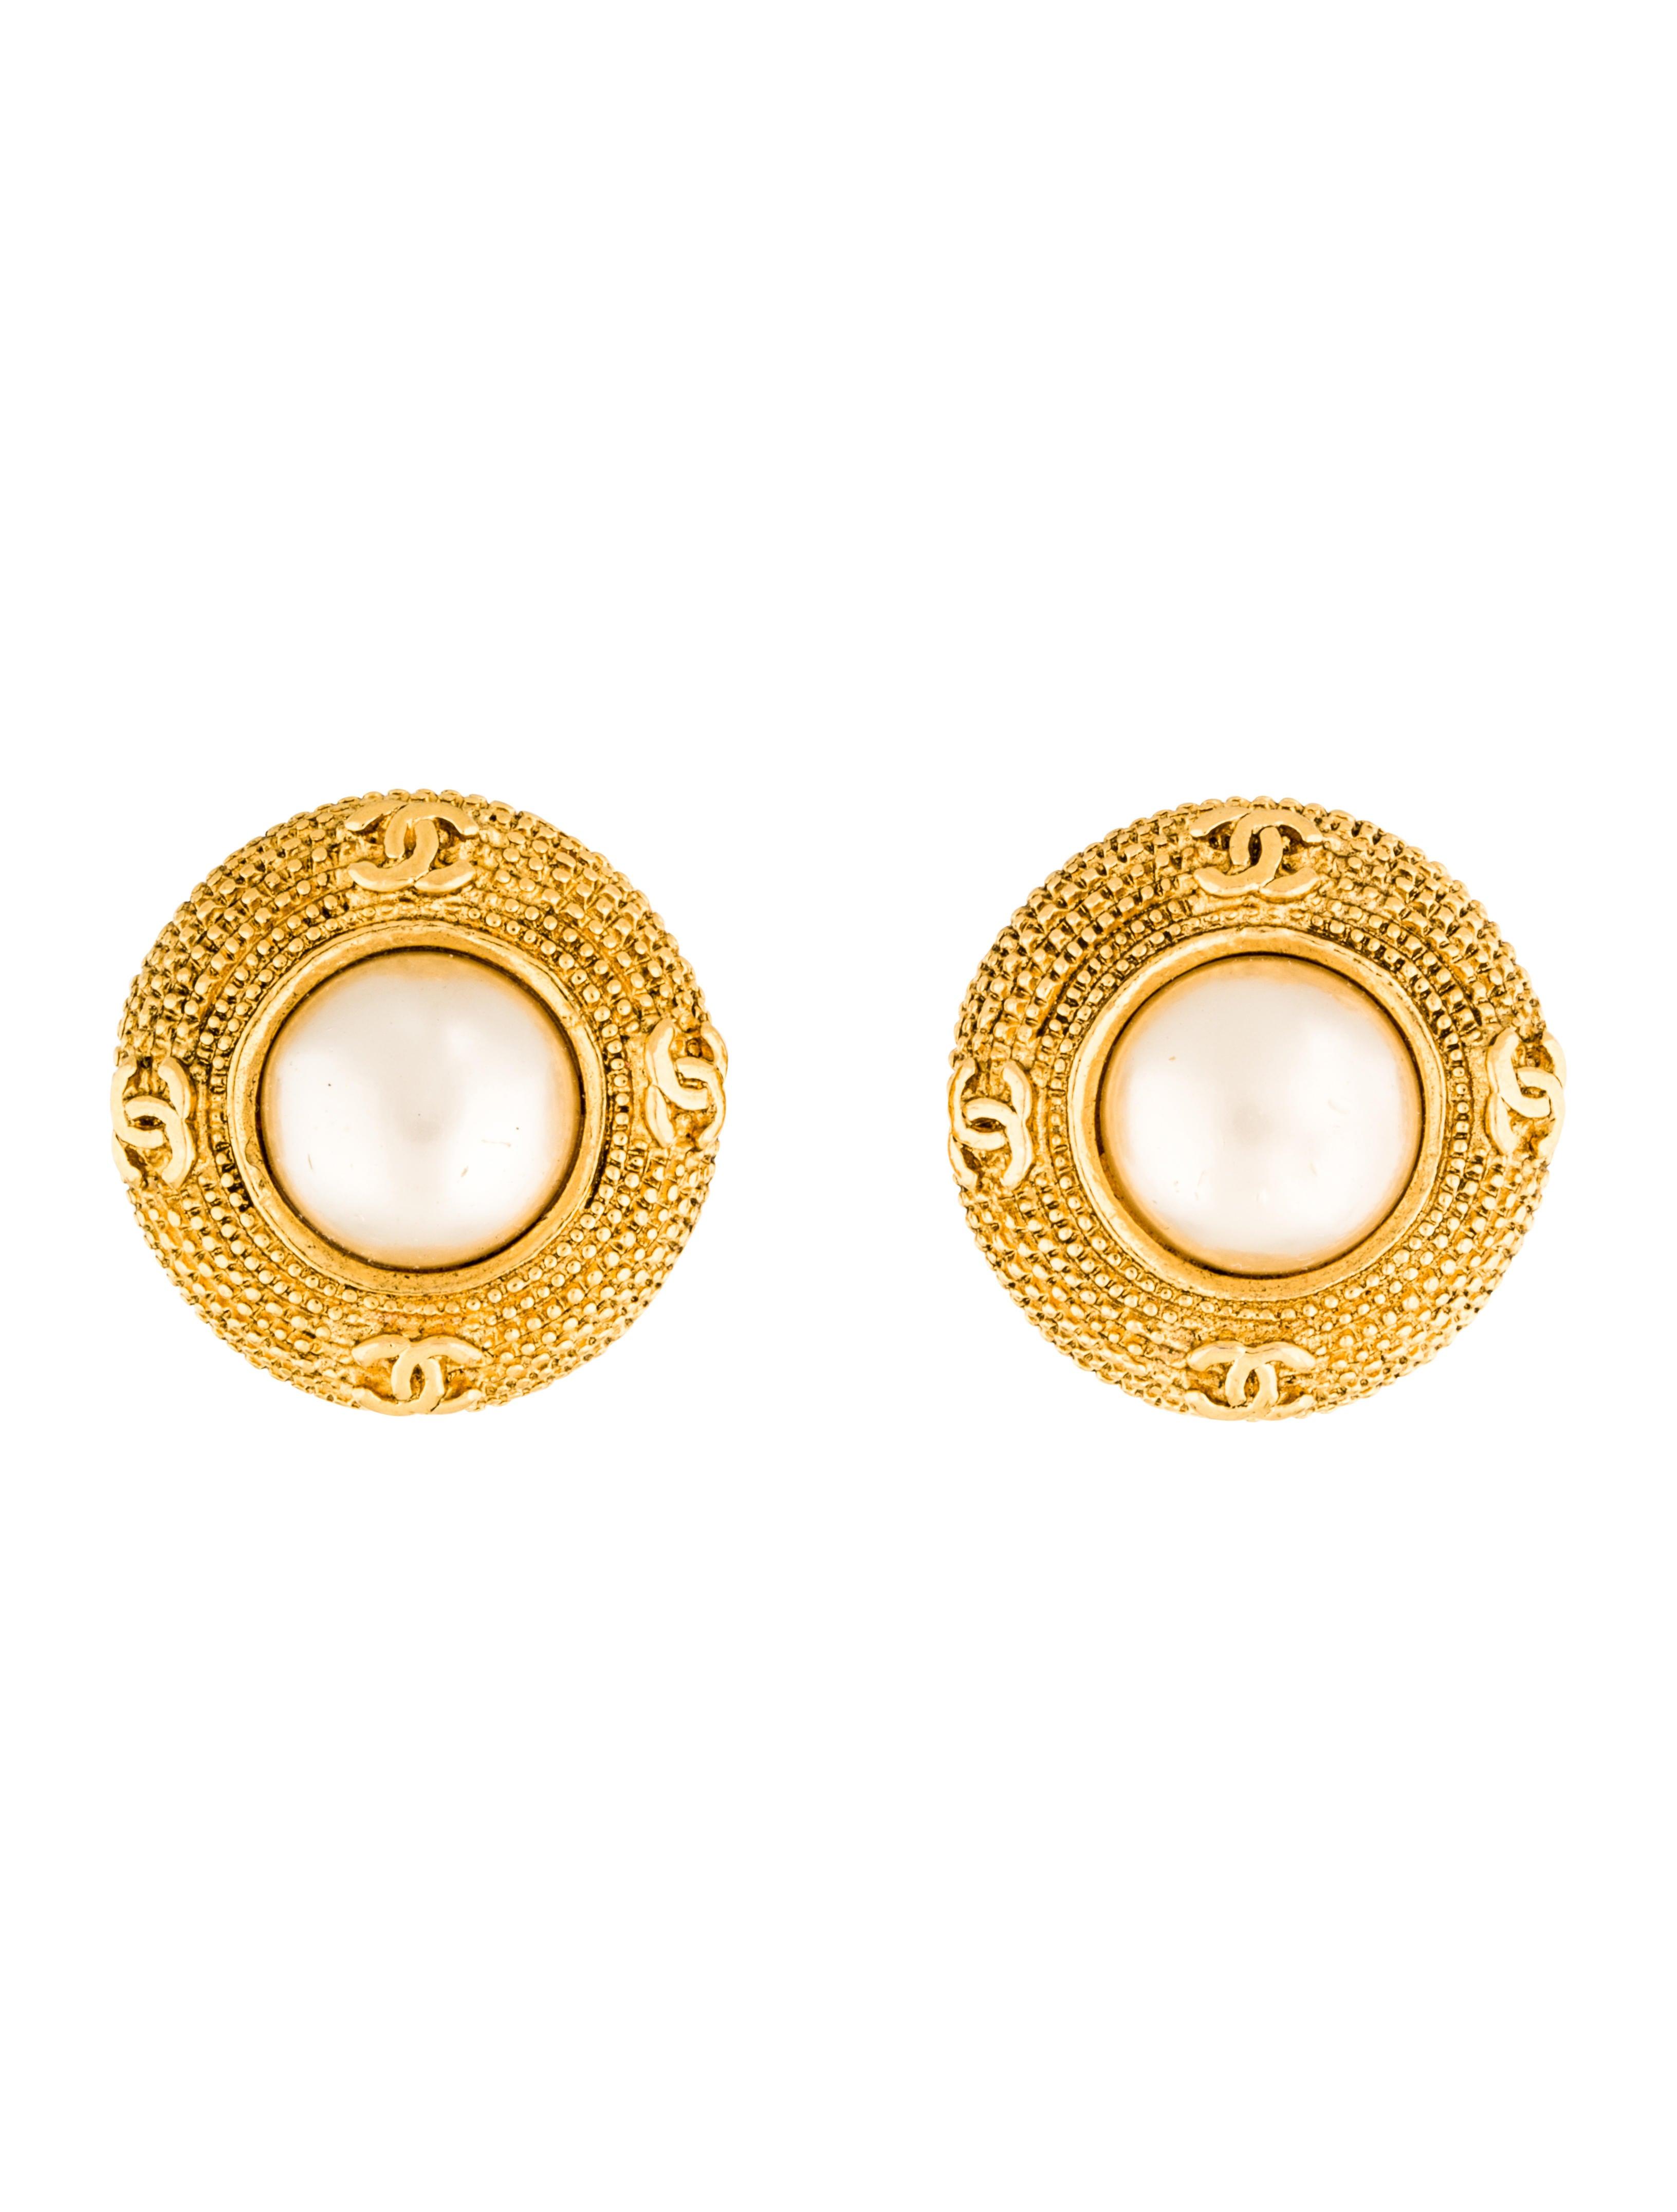 chanel faux pearl clip on earrings earrings cha172891. Black Bedroom Furniture Sets. Home Design Ideas